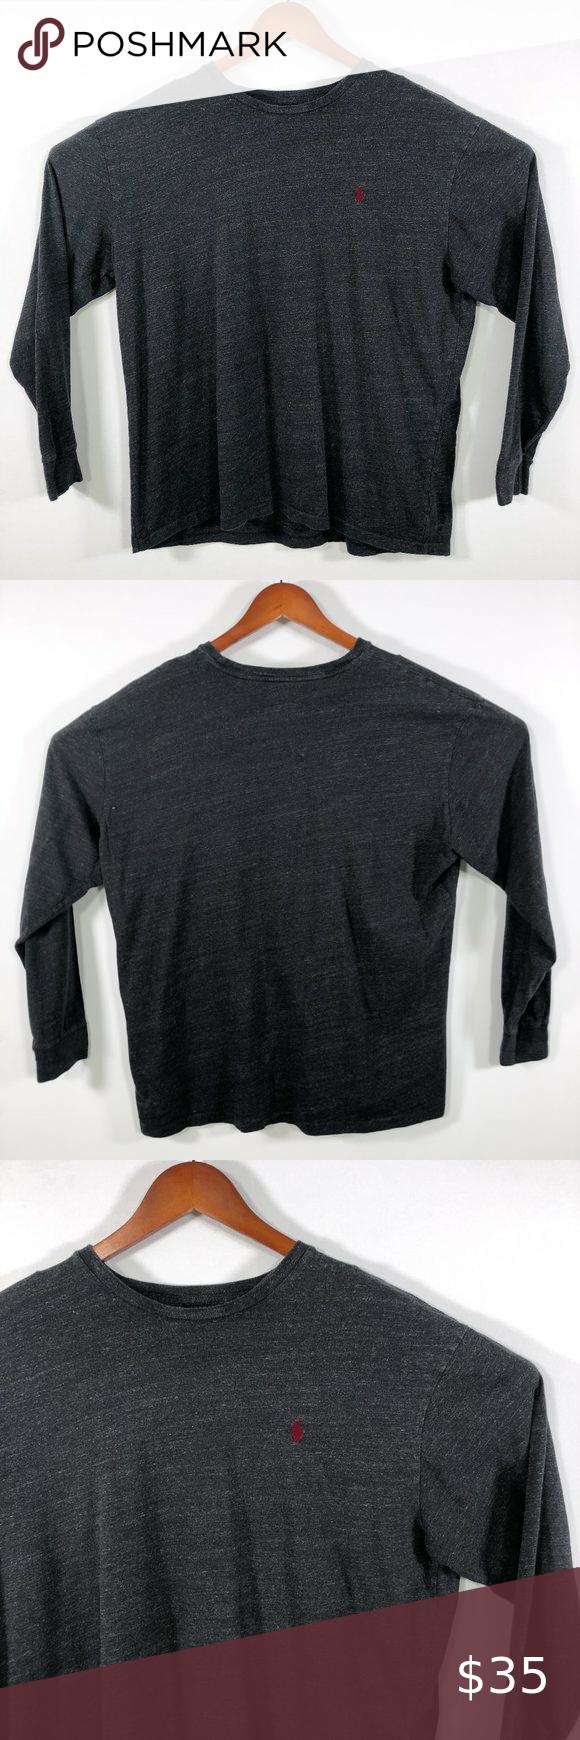 Polo Ralph Lauren Heather Grey Crewneck T Shirt Xl In 2020 Clothes Design Long Sleeve Tee Shirts Polo Ralph Lauren